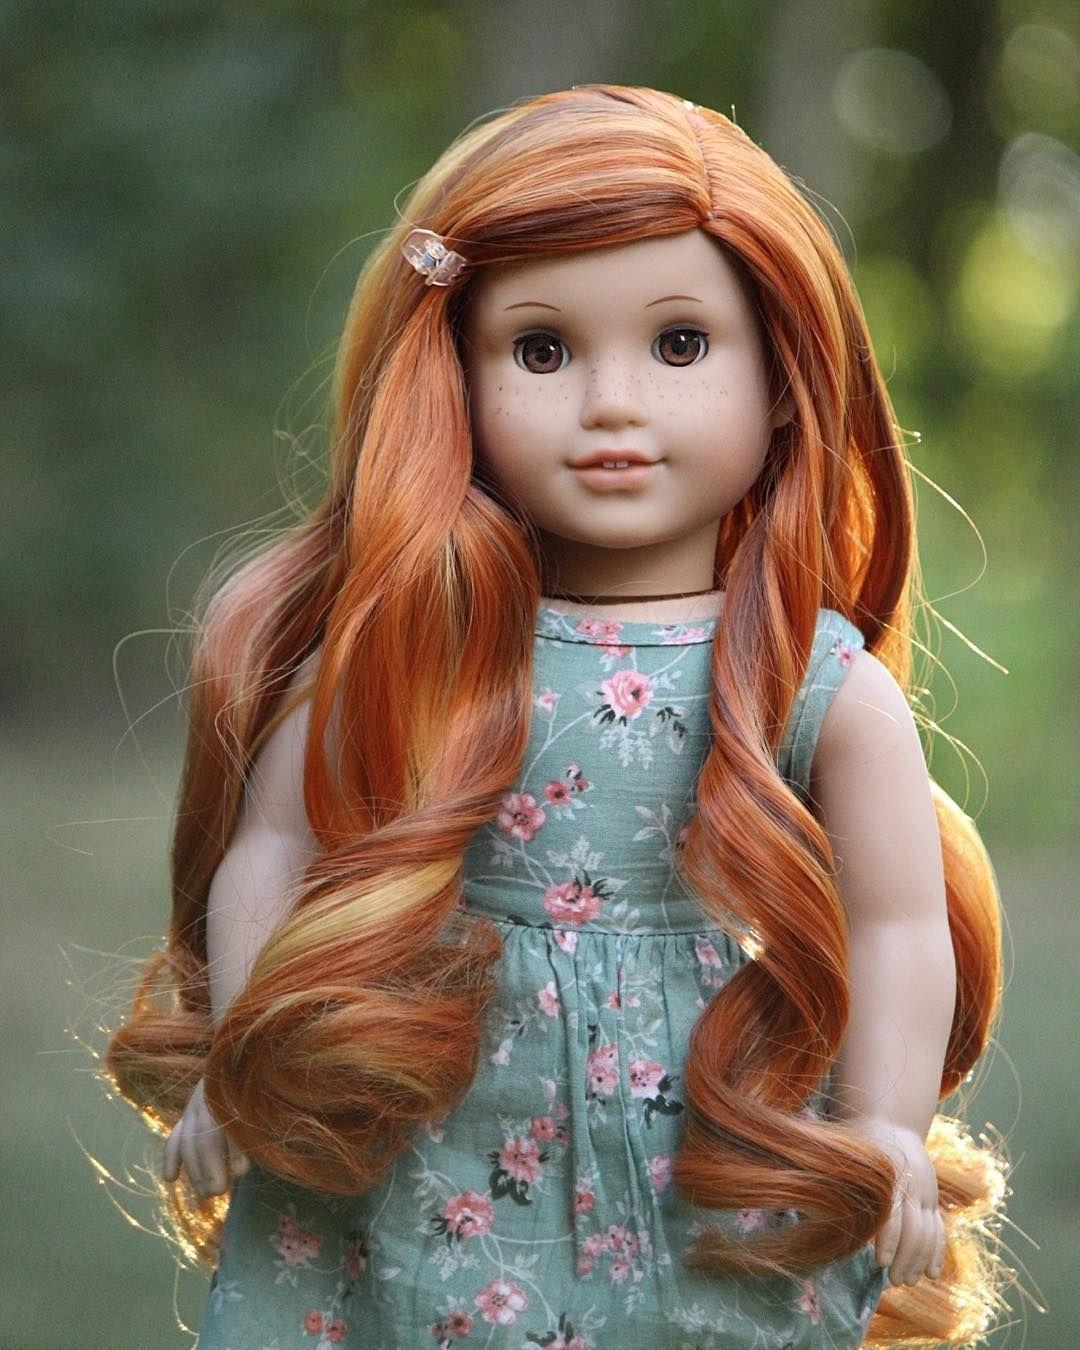 Pin by susan rinehart on american girl dolls pinterest american